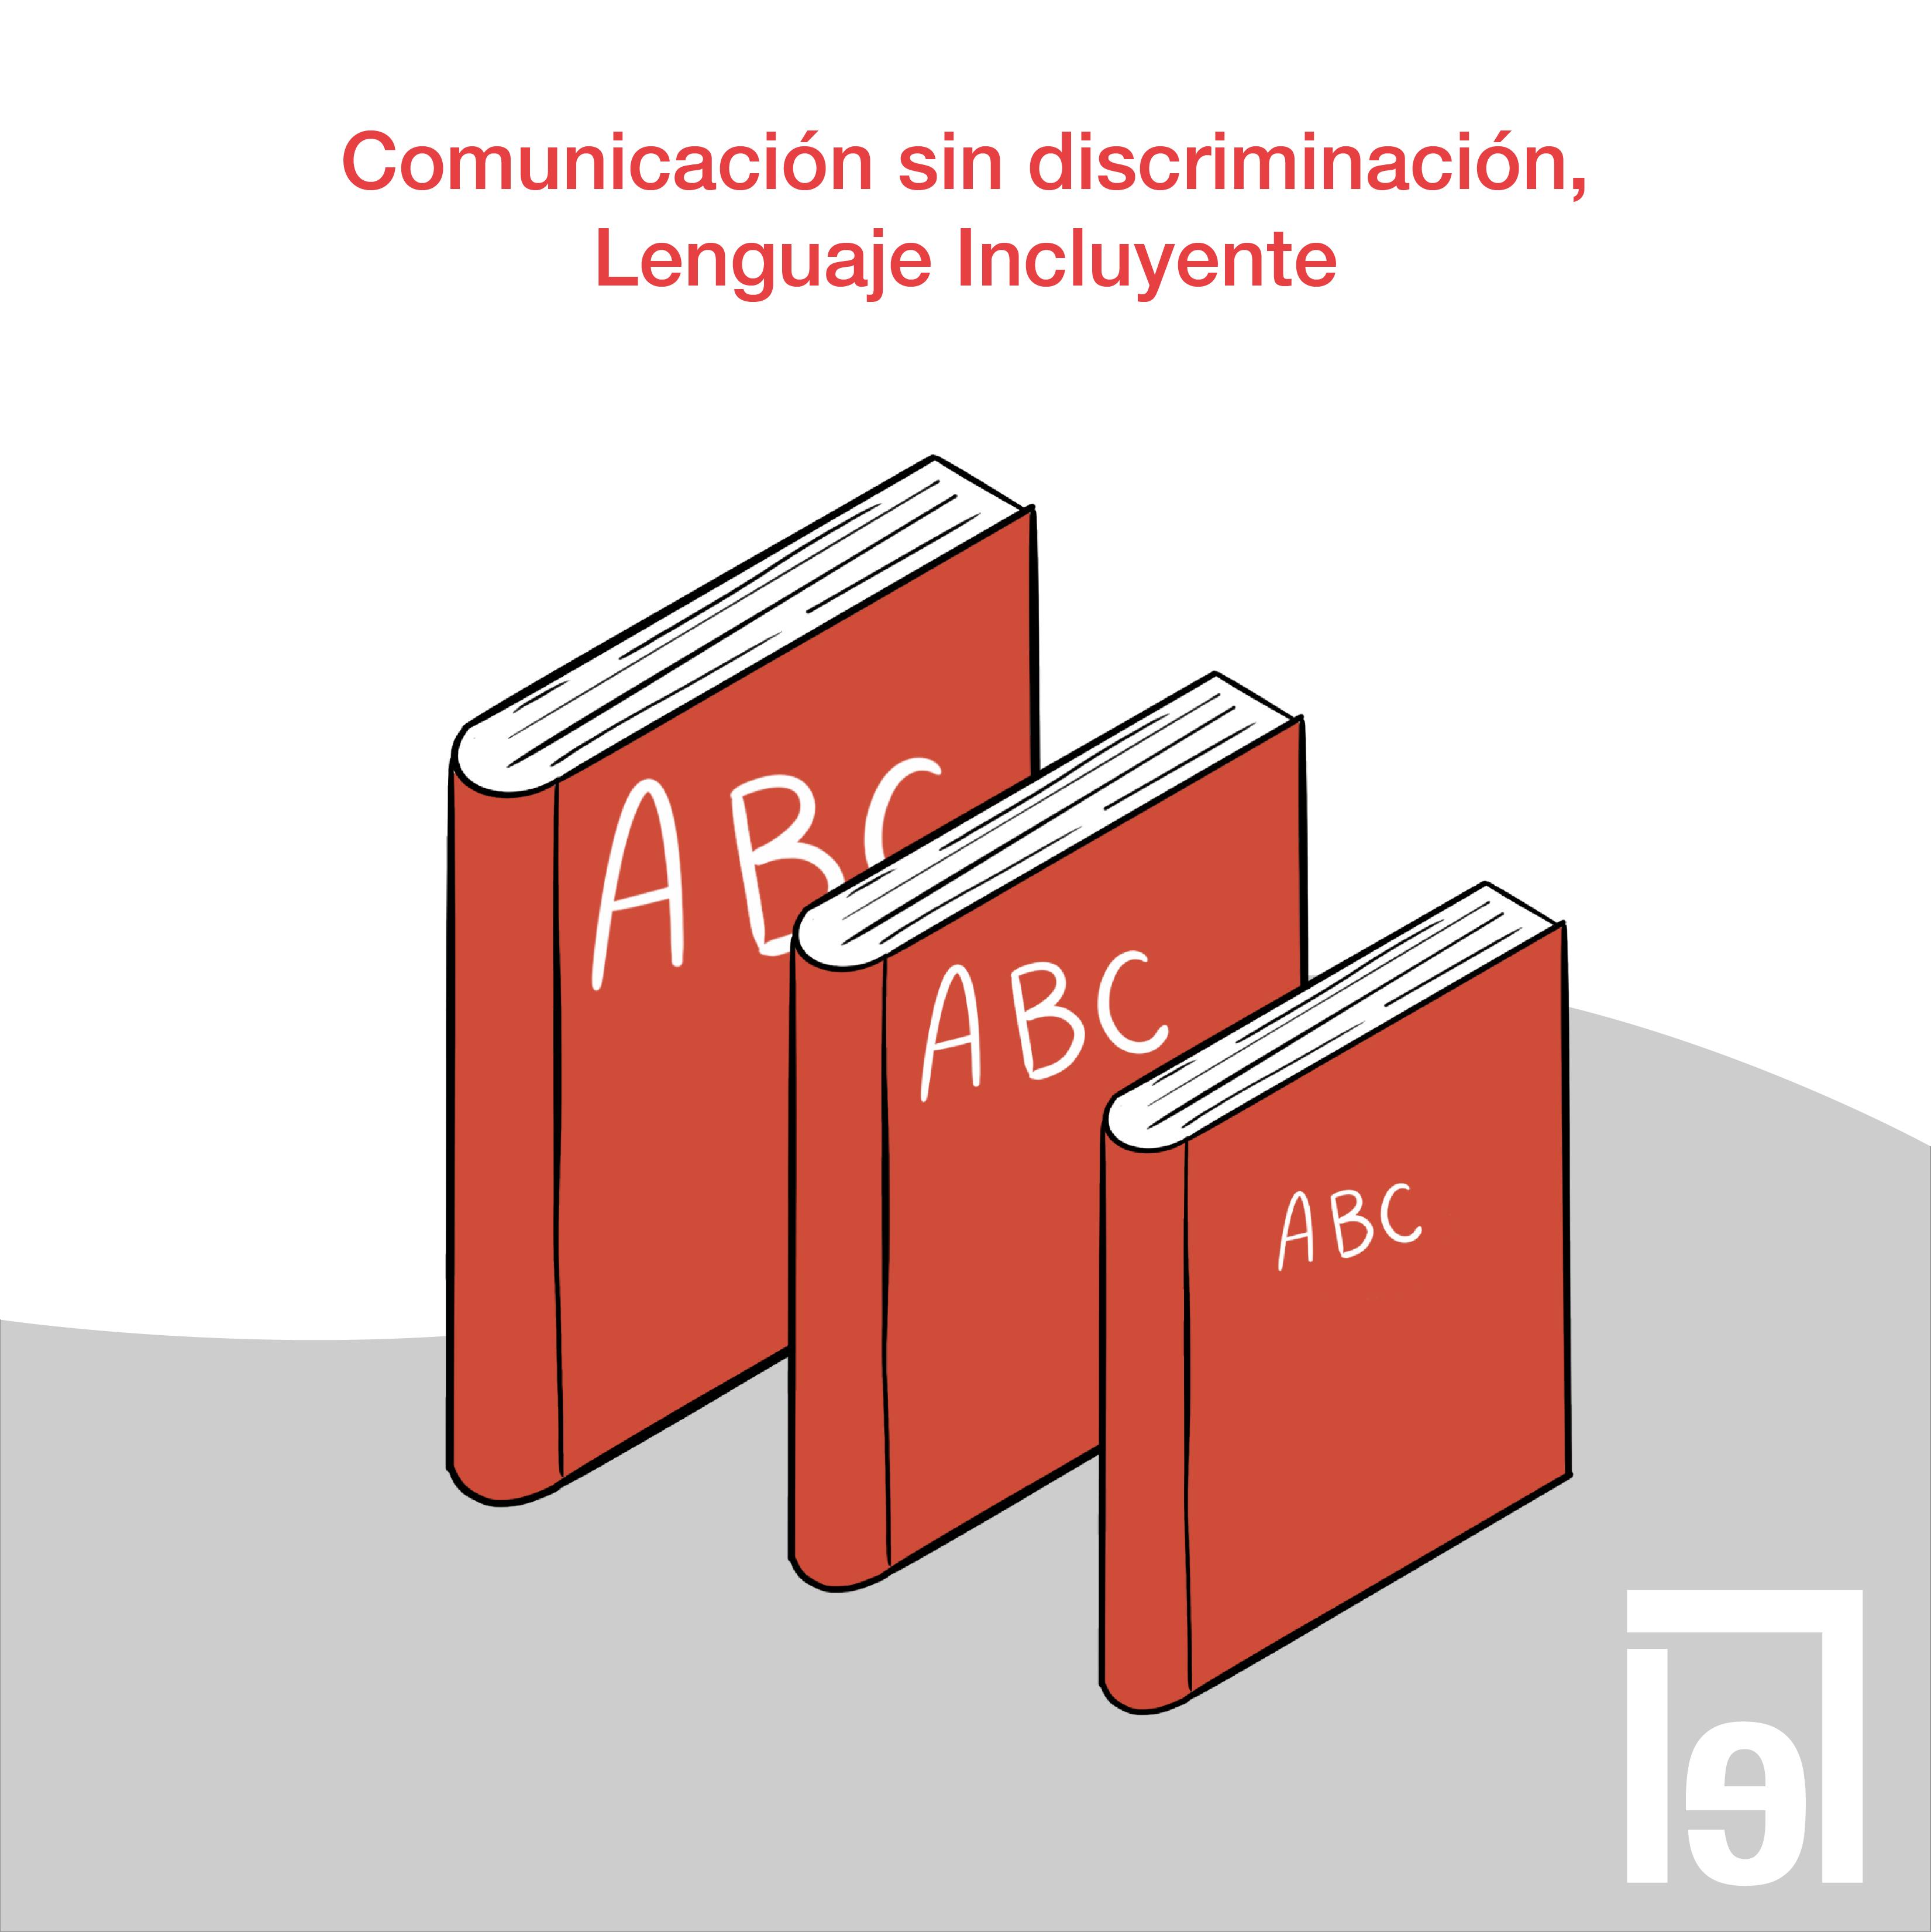 Comunicación sin discriminación, Lenguaje Incluyente